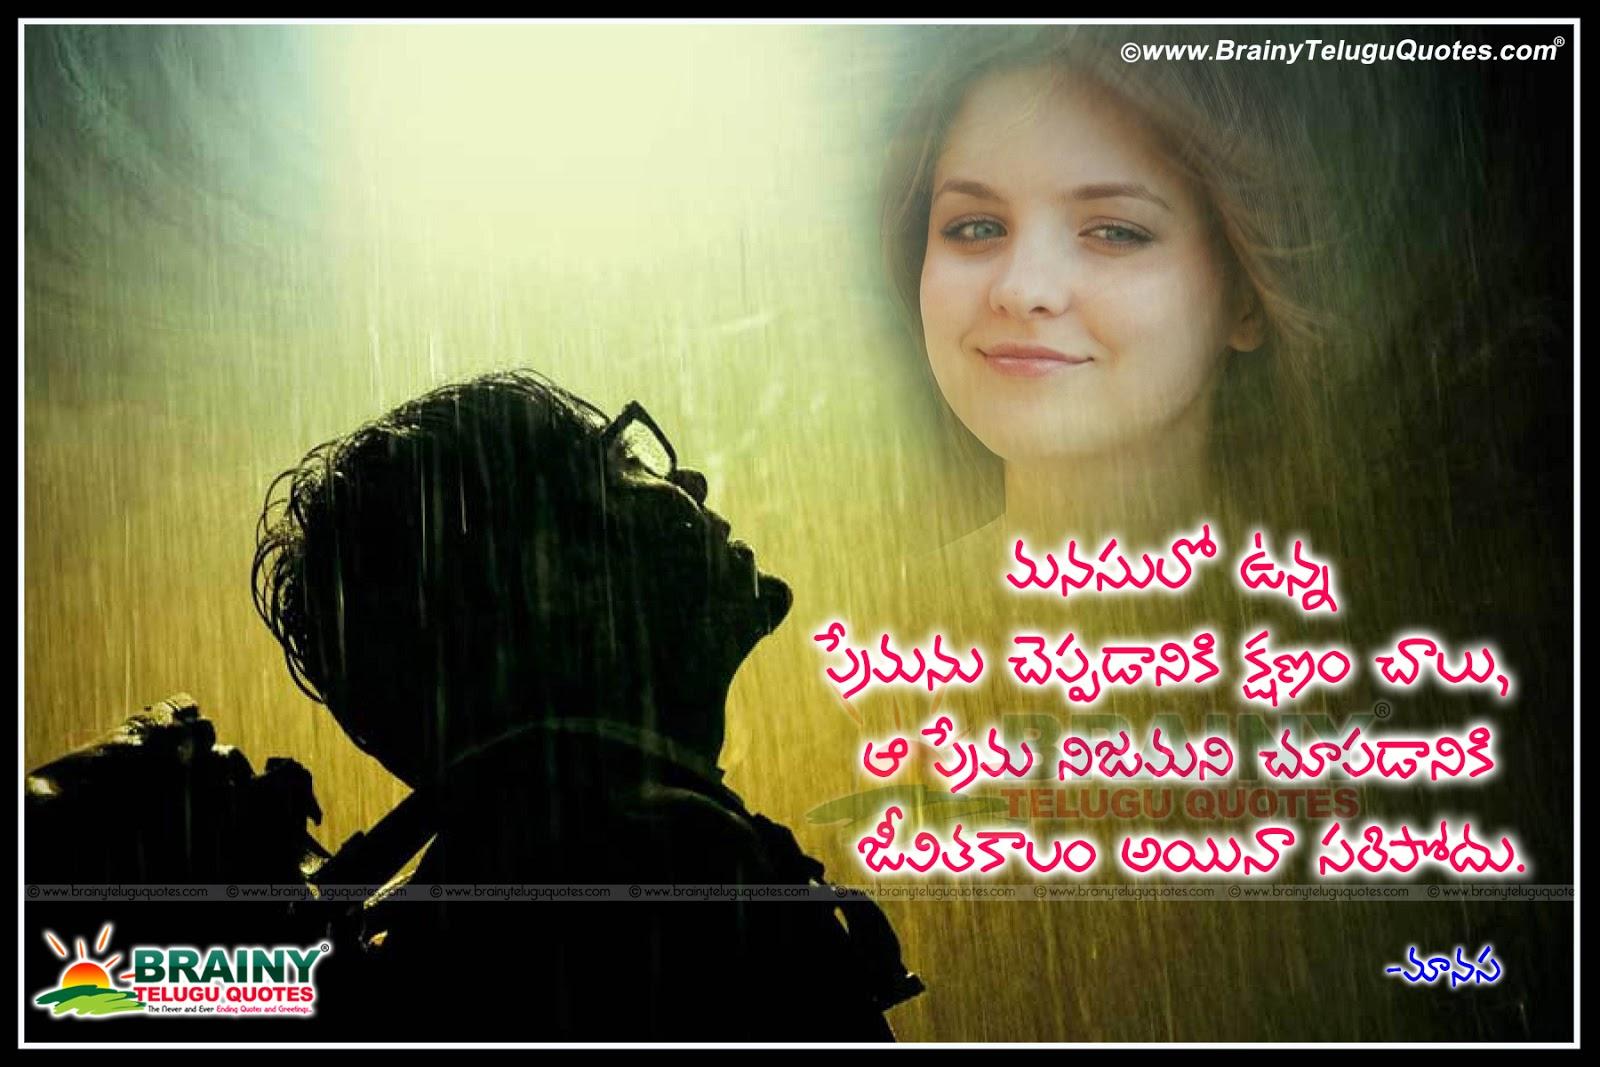 Telugu Latest love Failure Prema kavithalu with Alone Love Sad Heart Touching Love Failure Alone Lover boy Quotes Telugu Sad Love Failure